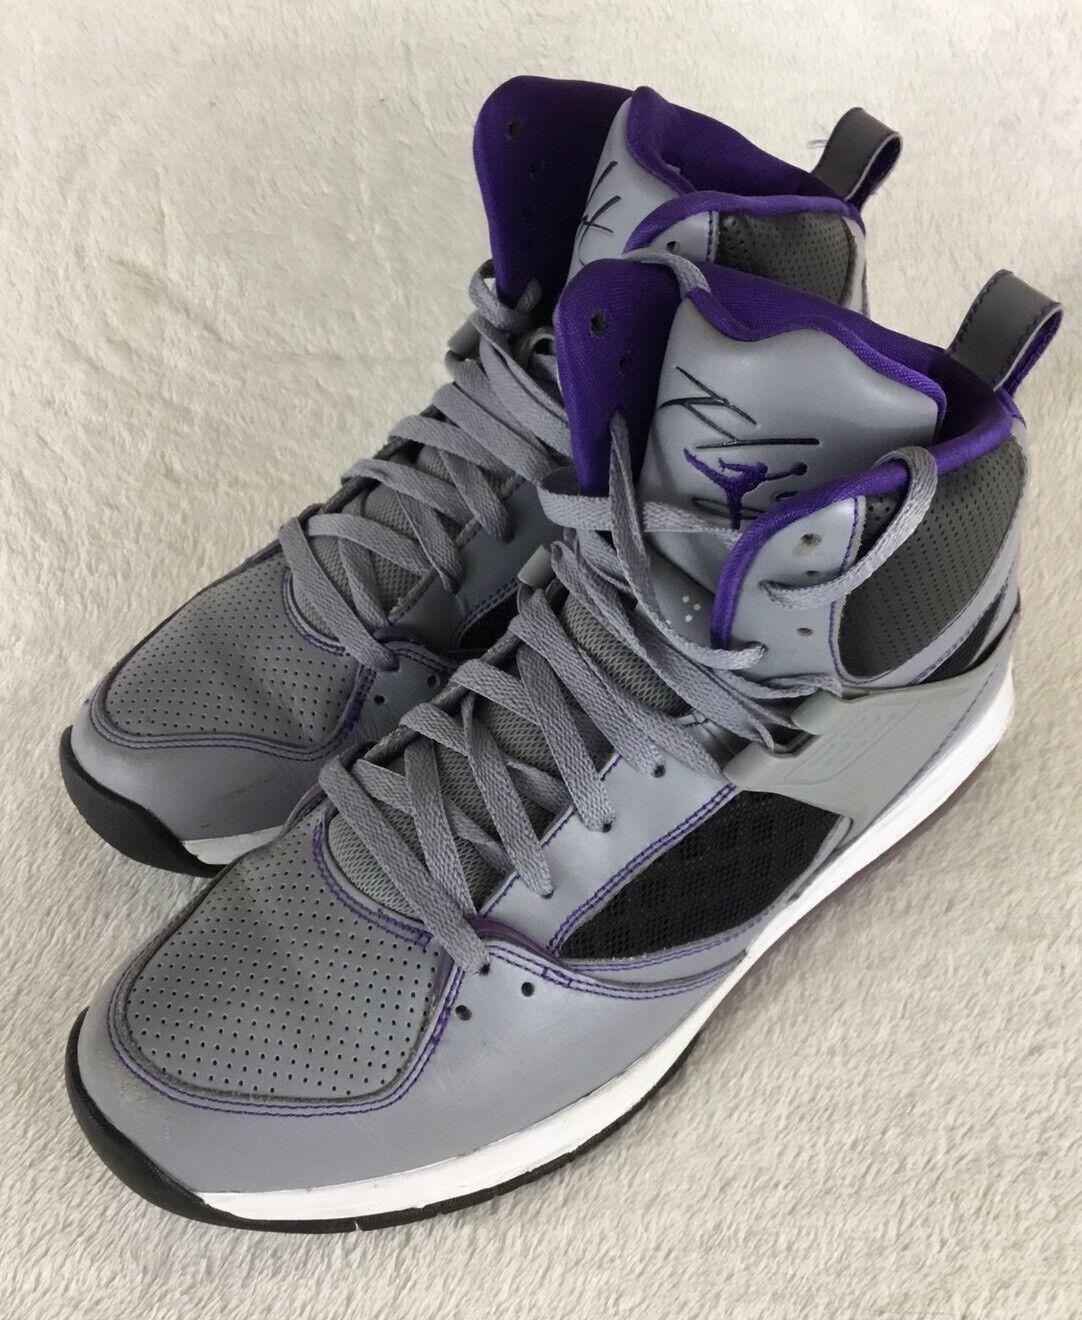 Nike air jordan volo 45 alta corte viola, nero 524866-008 sz max stealth